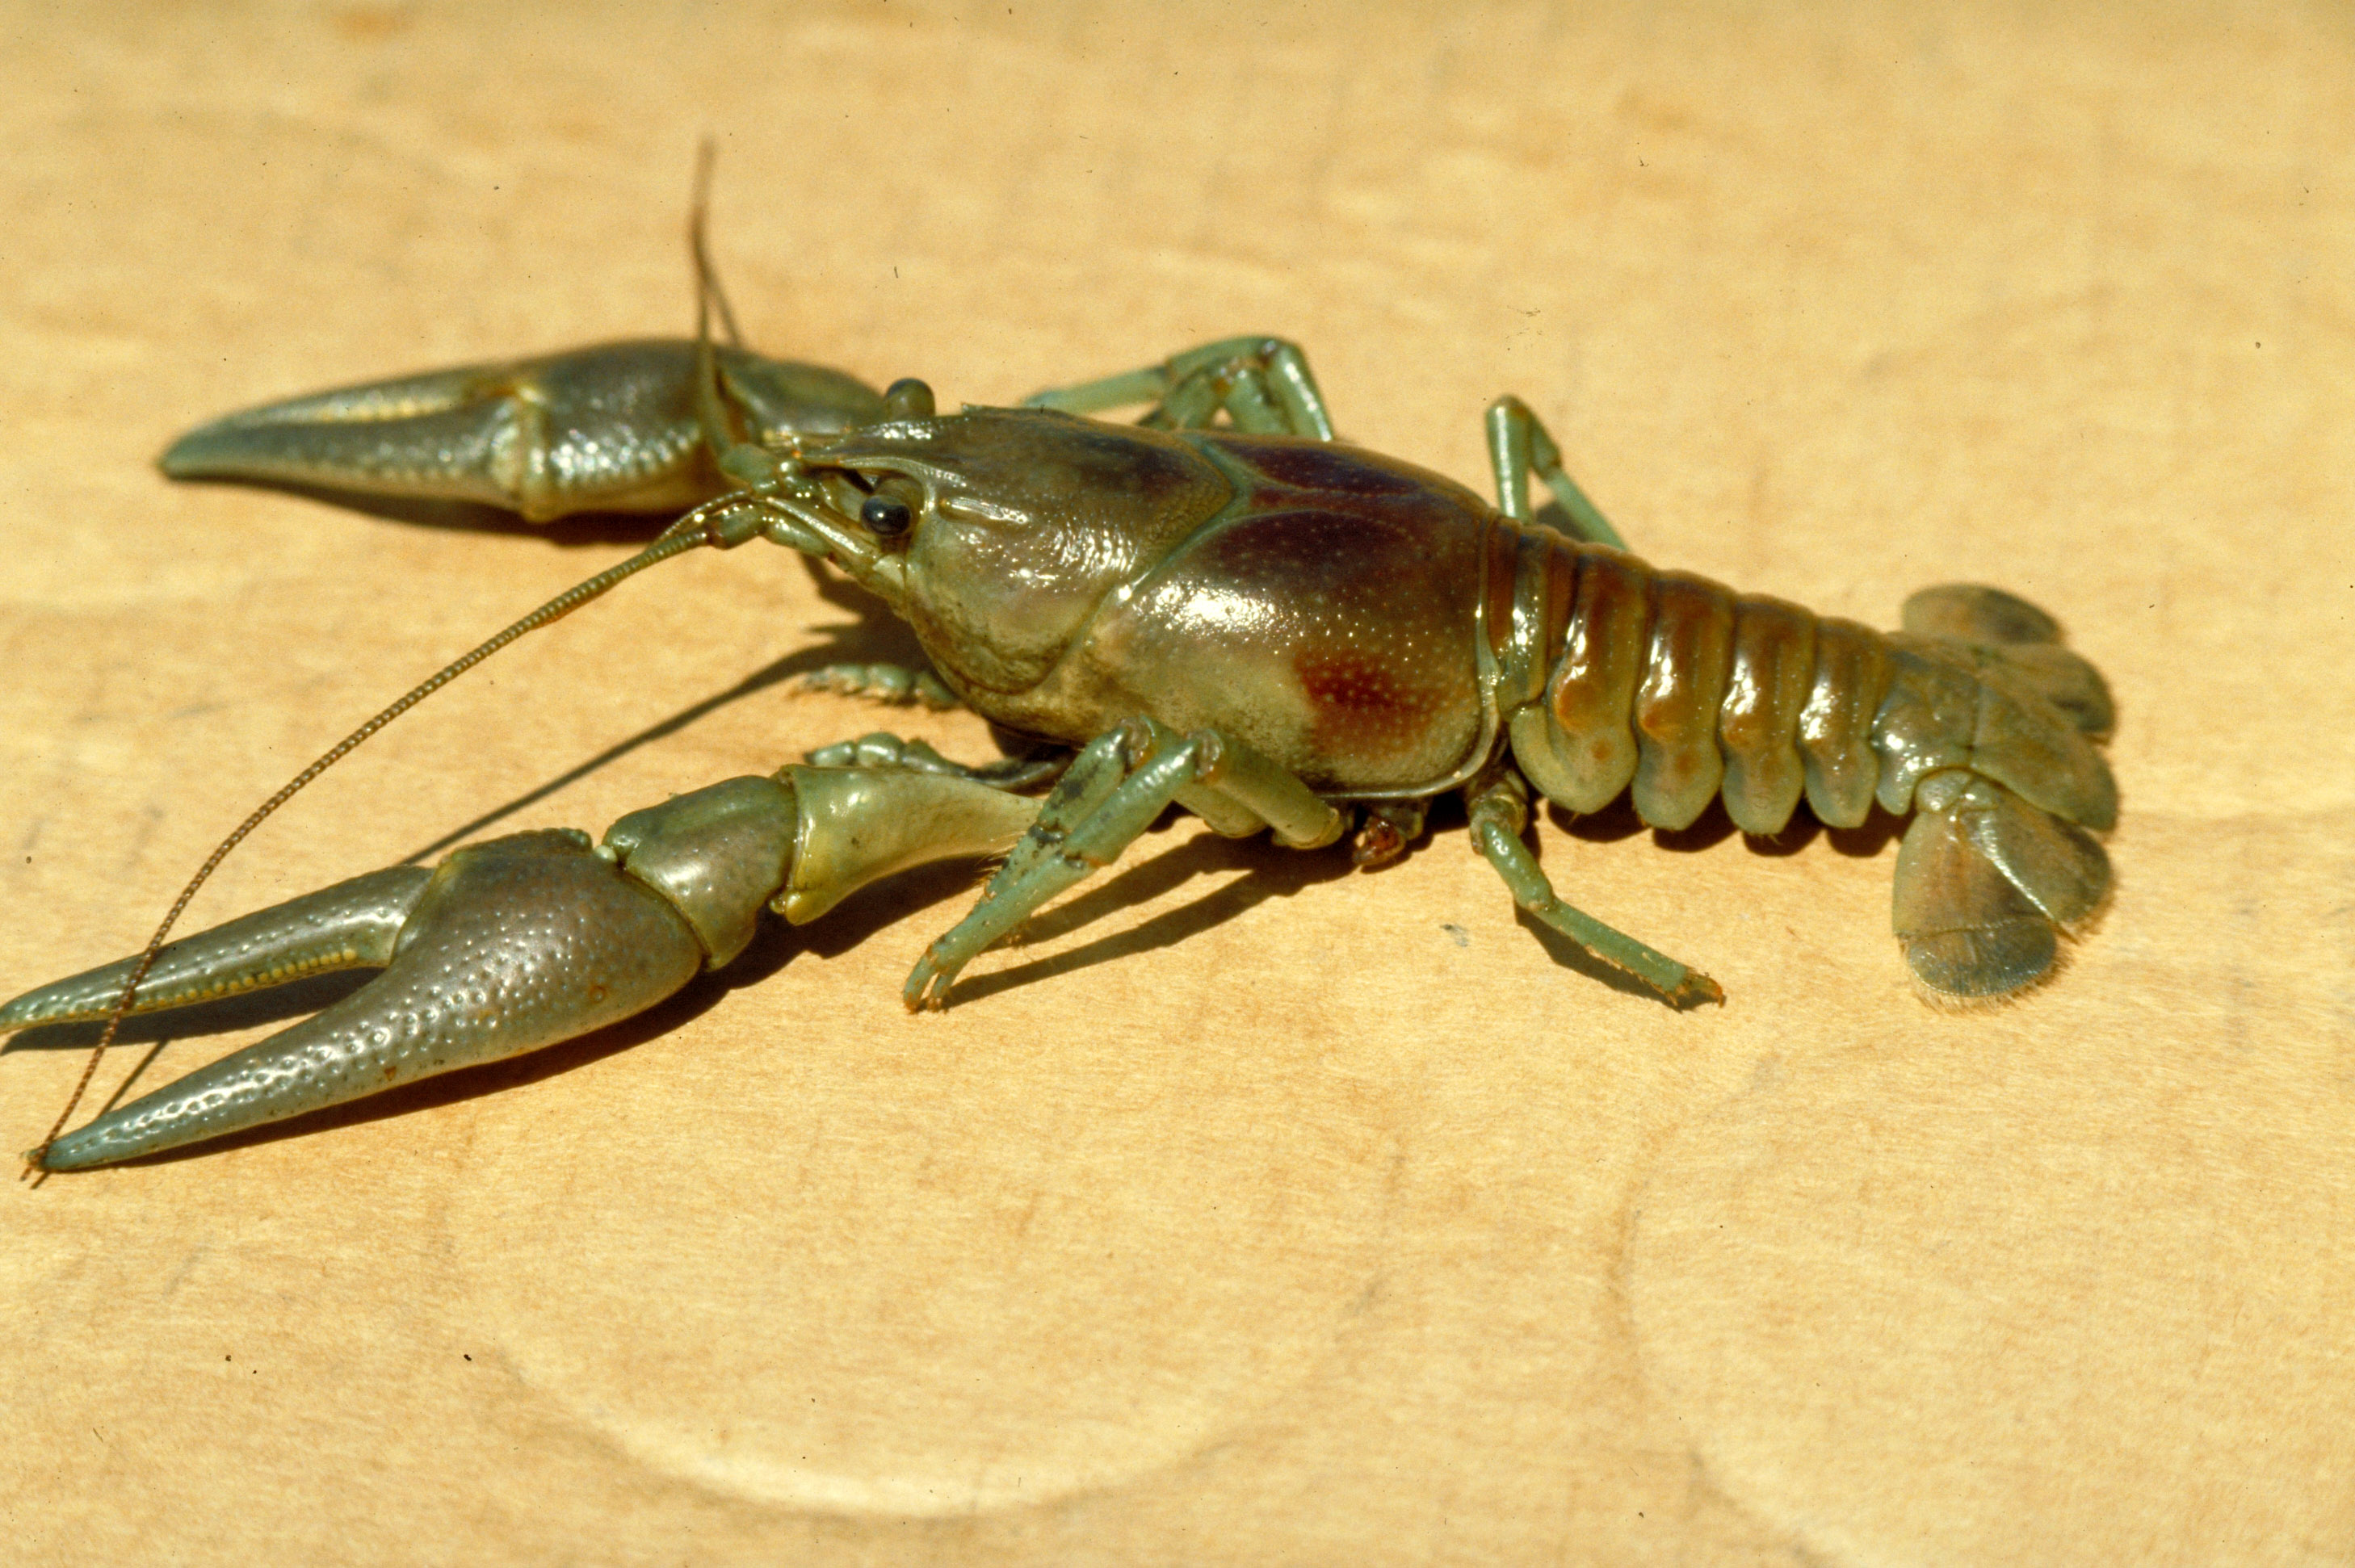 10 invasive species threatening Canadian habitats   CBC News